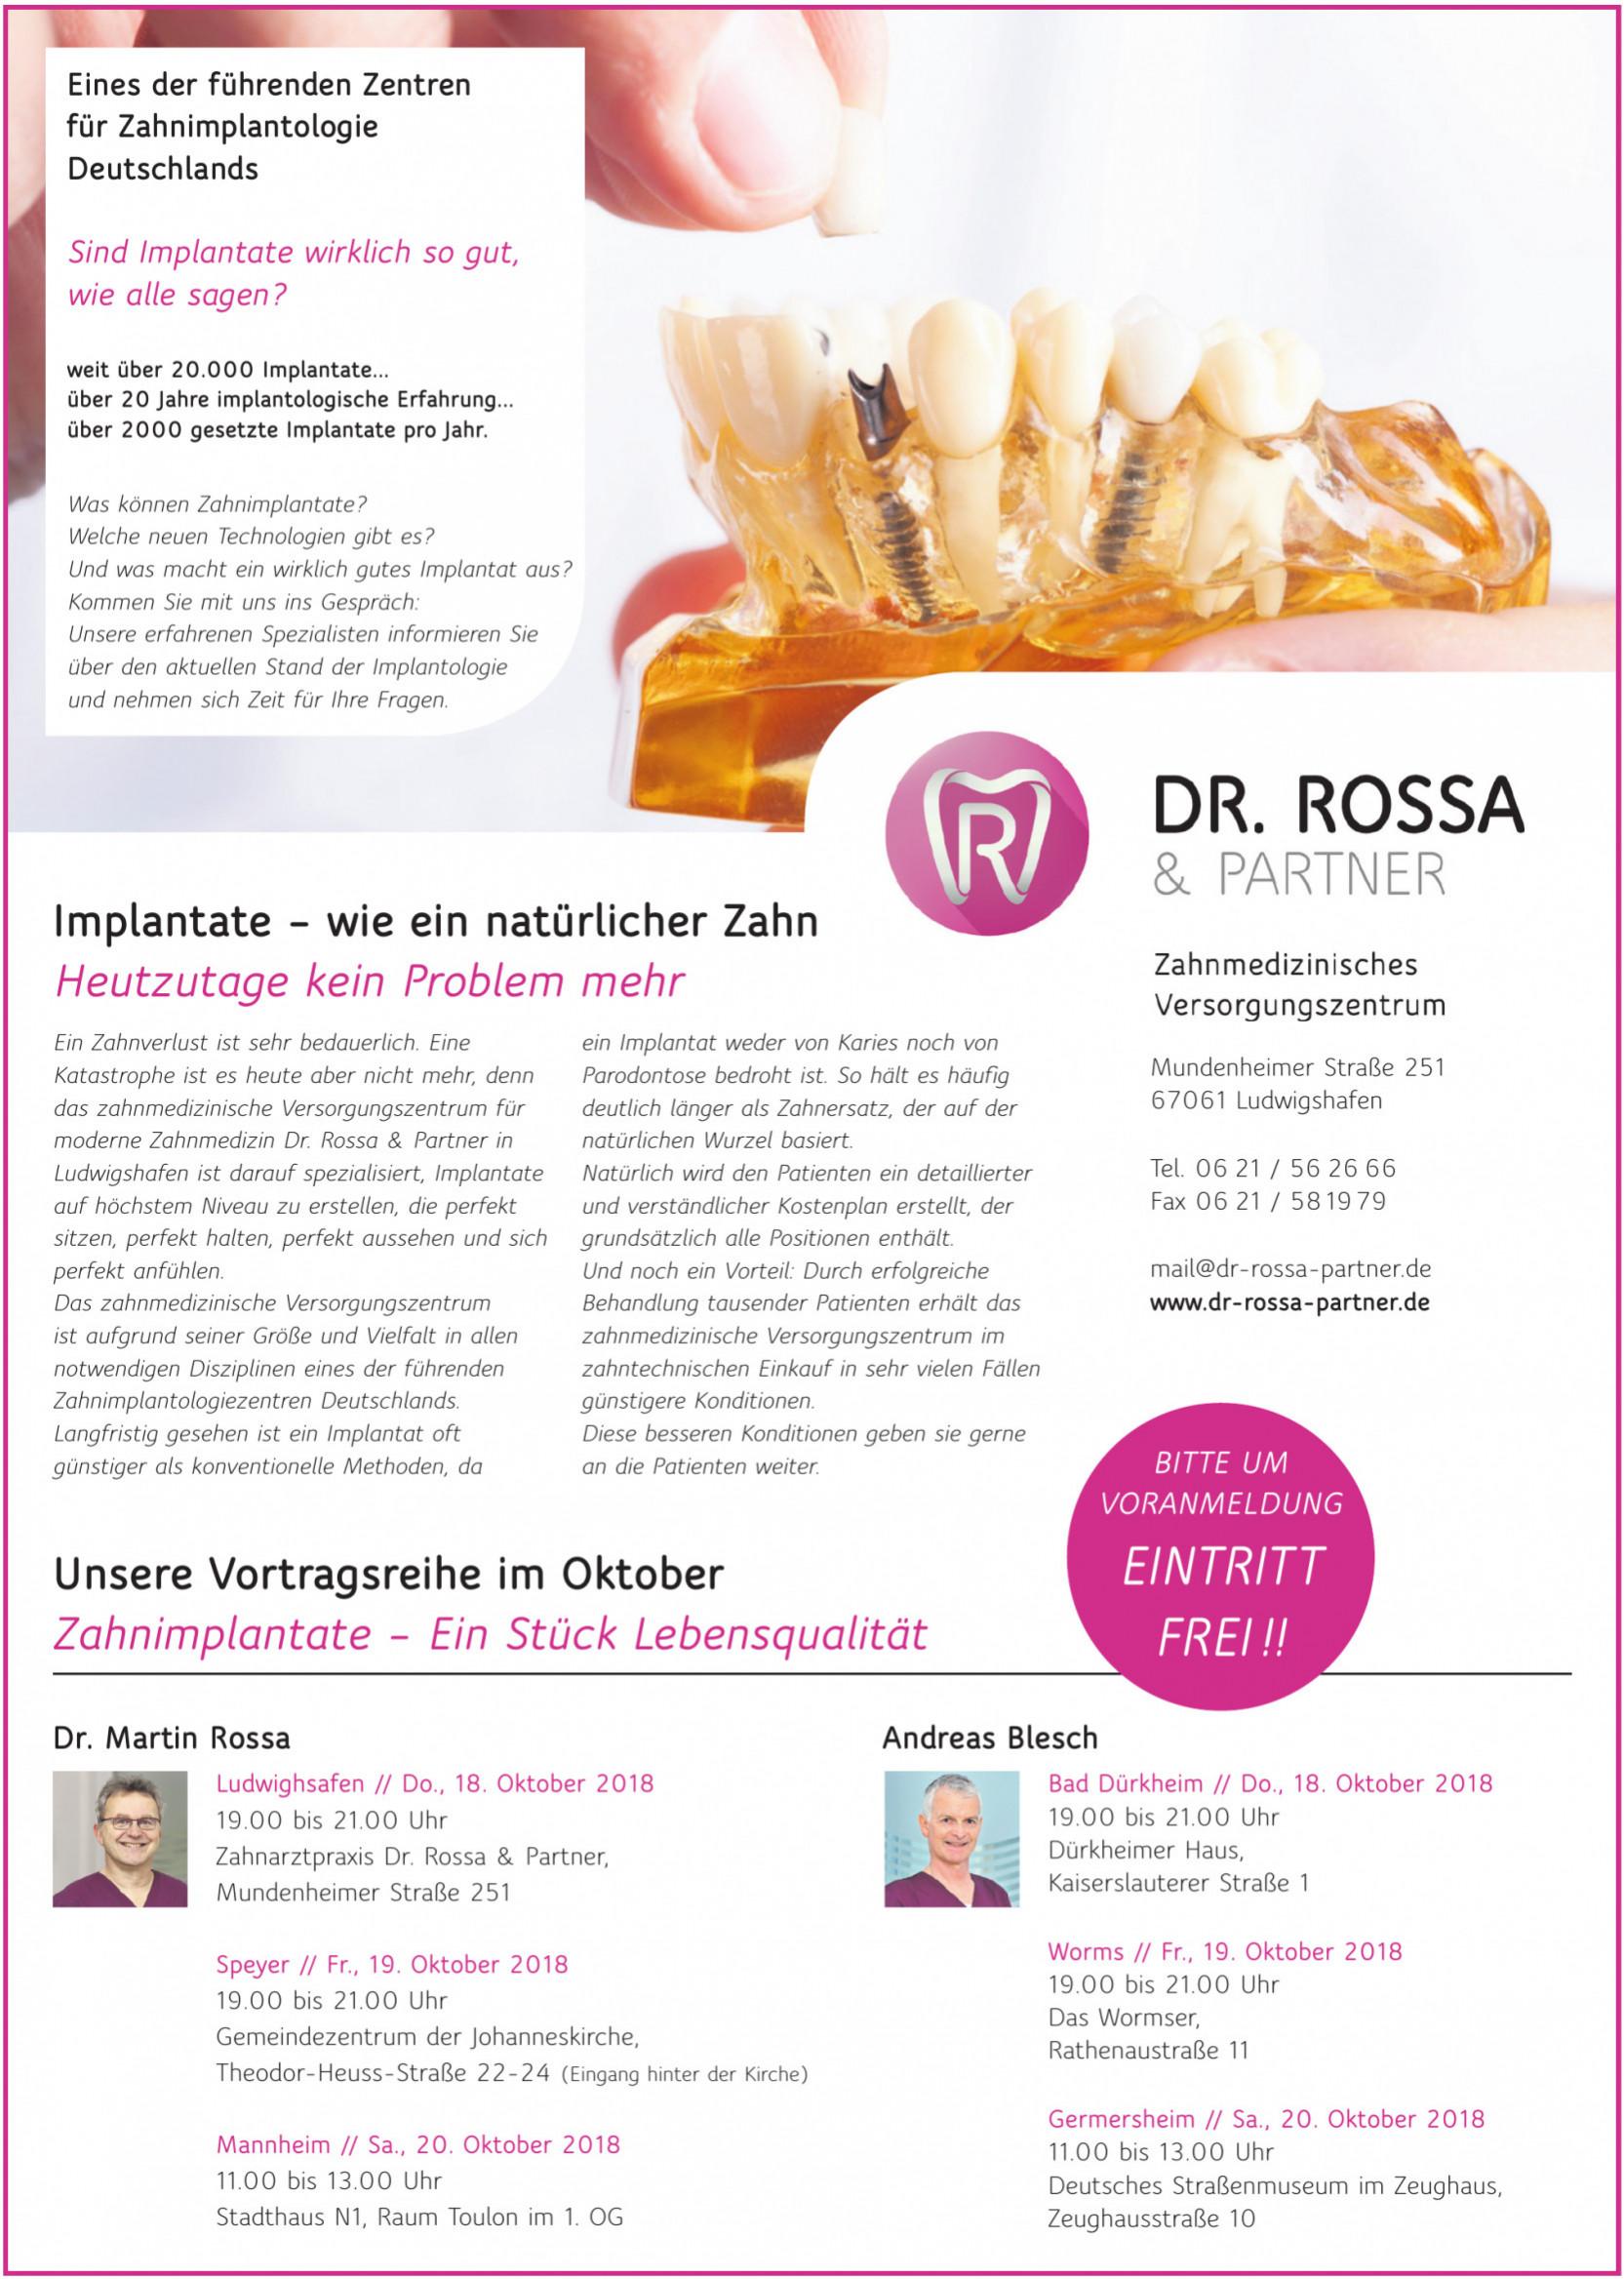 Dr. Rossa & Partner